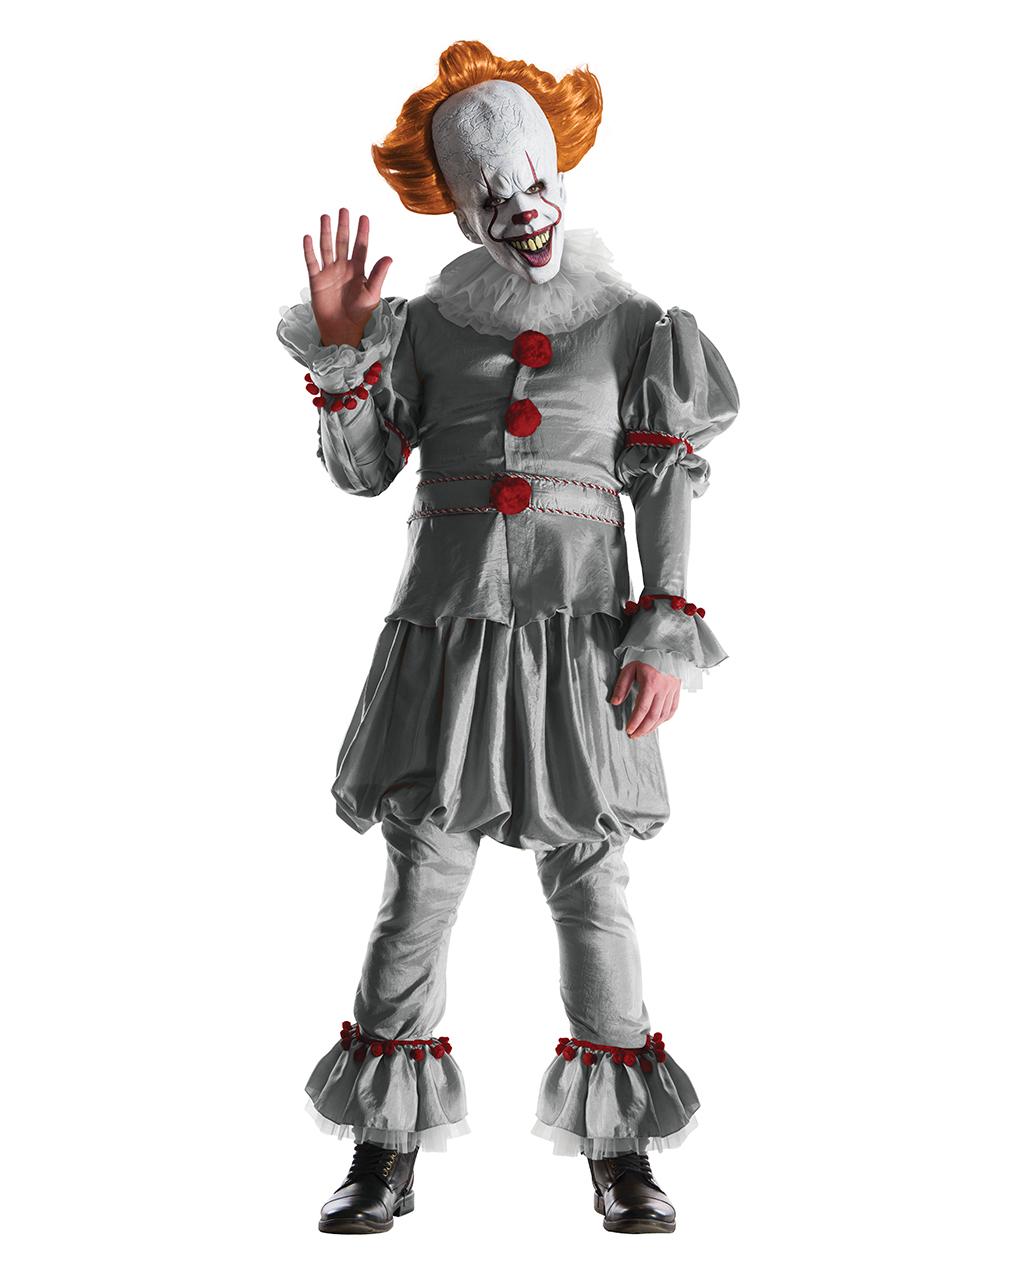 Fancy Dress & Period Costume Adult Creepy Zombie Clown Costume Sexy Scary Jester Ladies Halloween Fancy Dress StraßEnpreis Fancy Dress